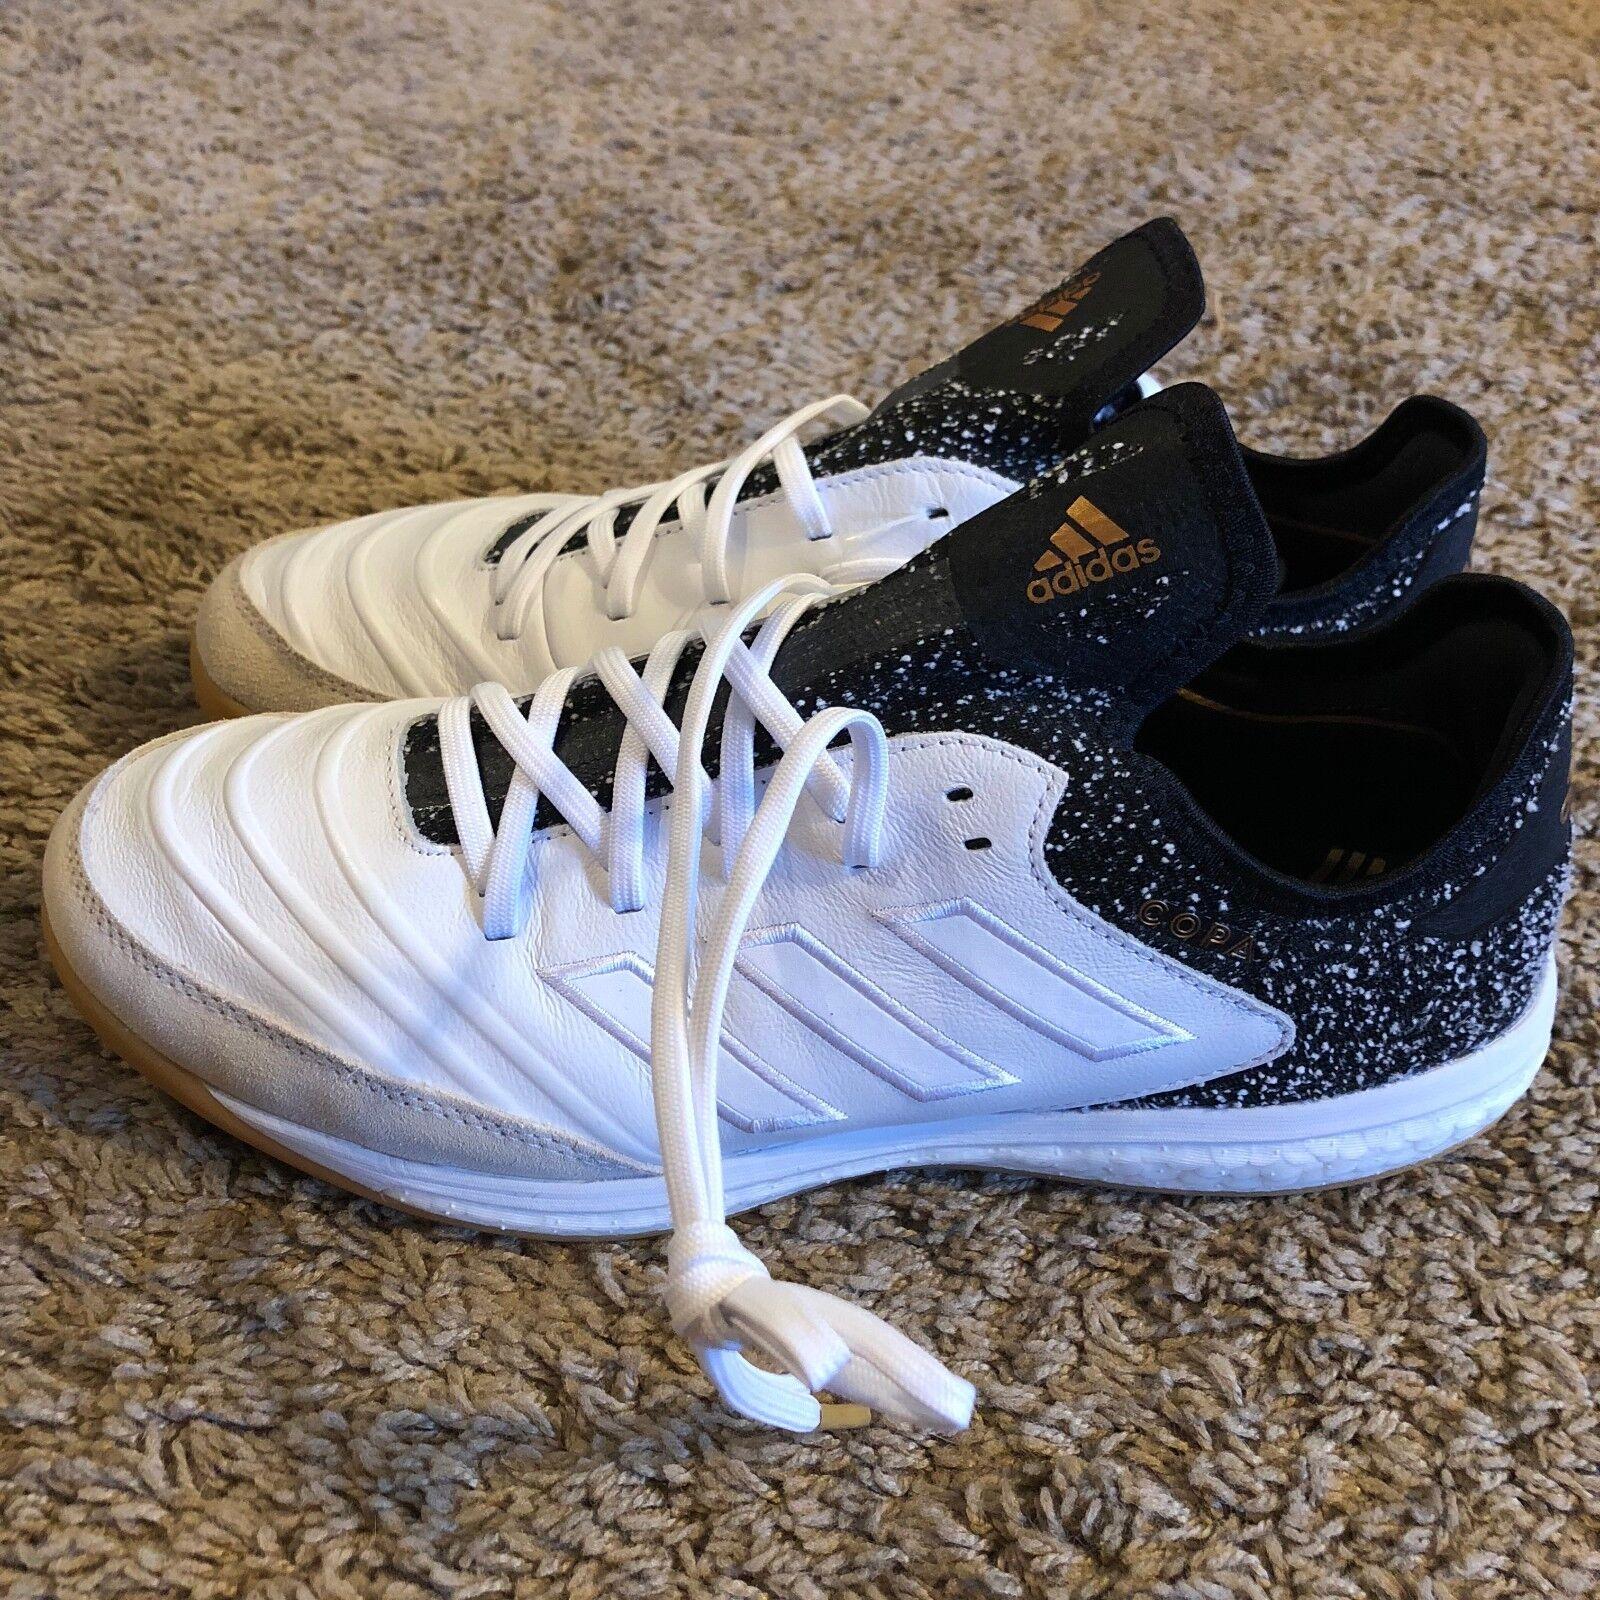 Bei adidas copa - tango 18,1 größe 10 - copa fußball - stiefel cp8997 fußball - schuhe 2fed17